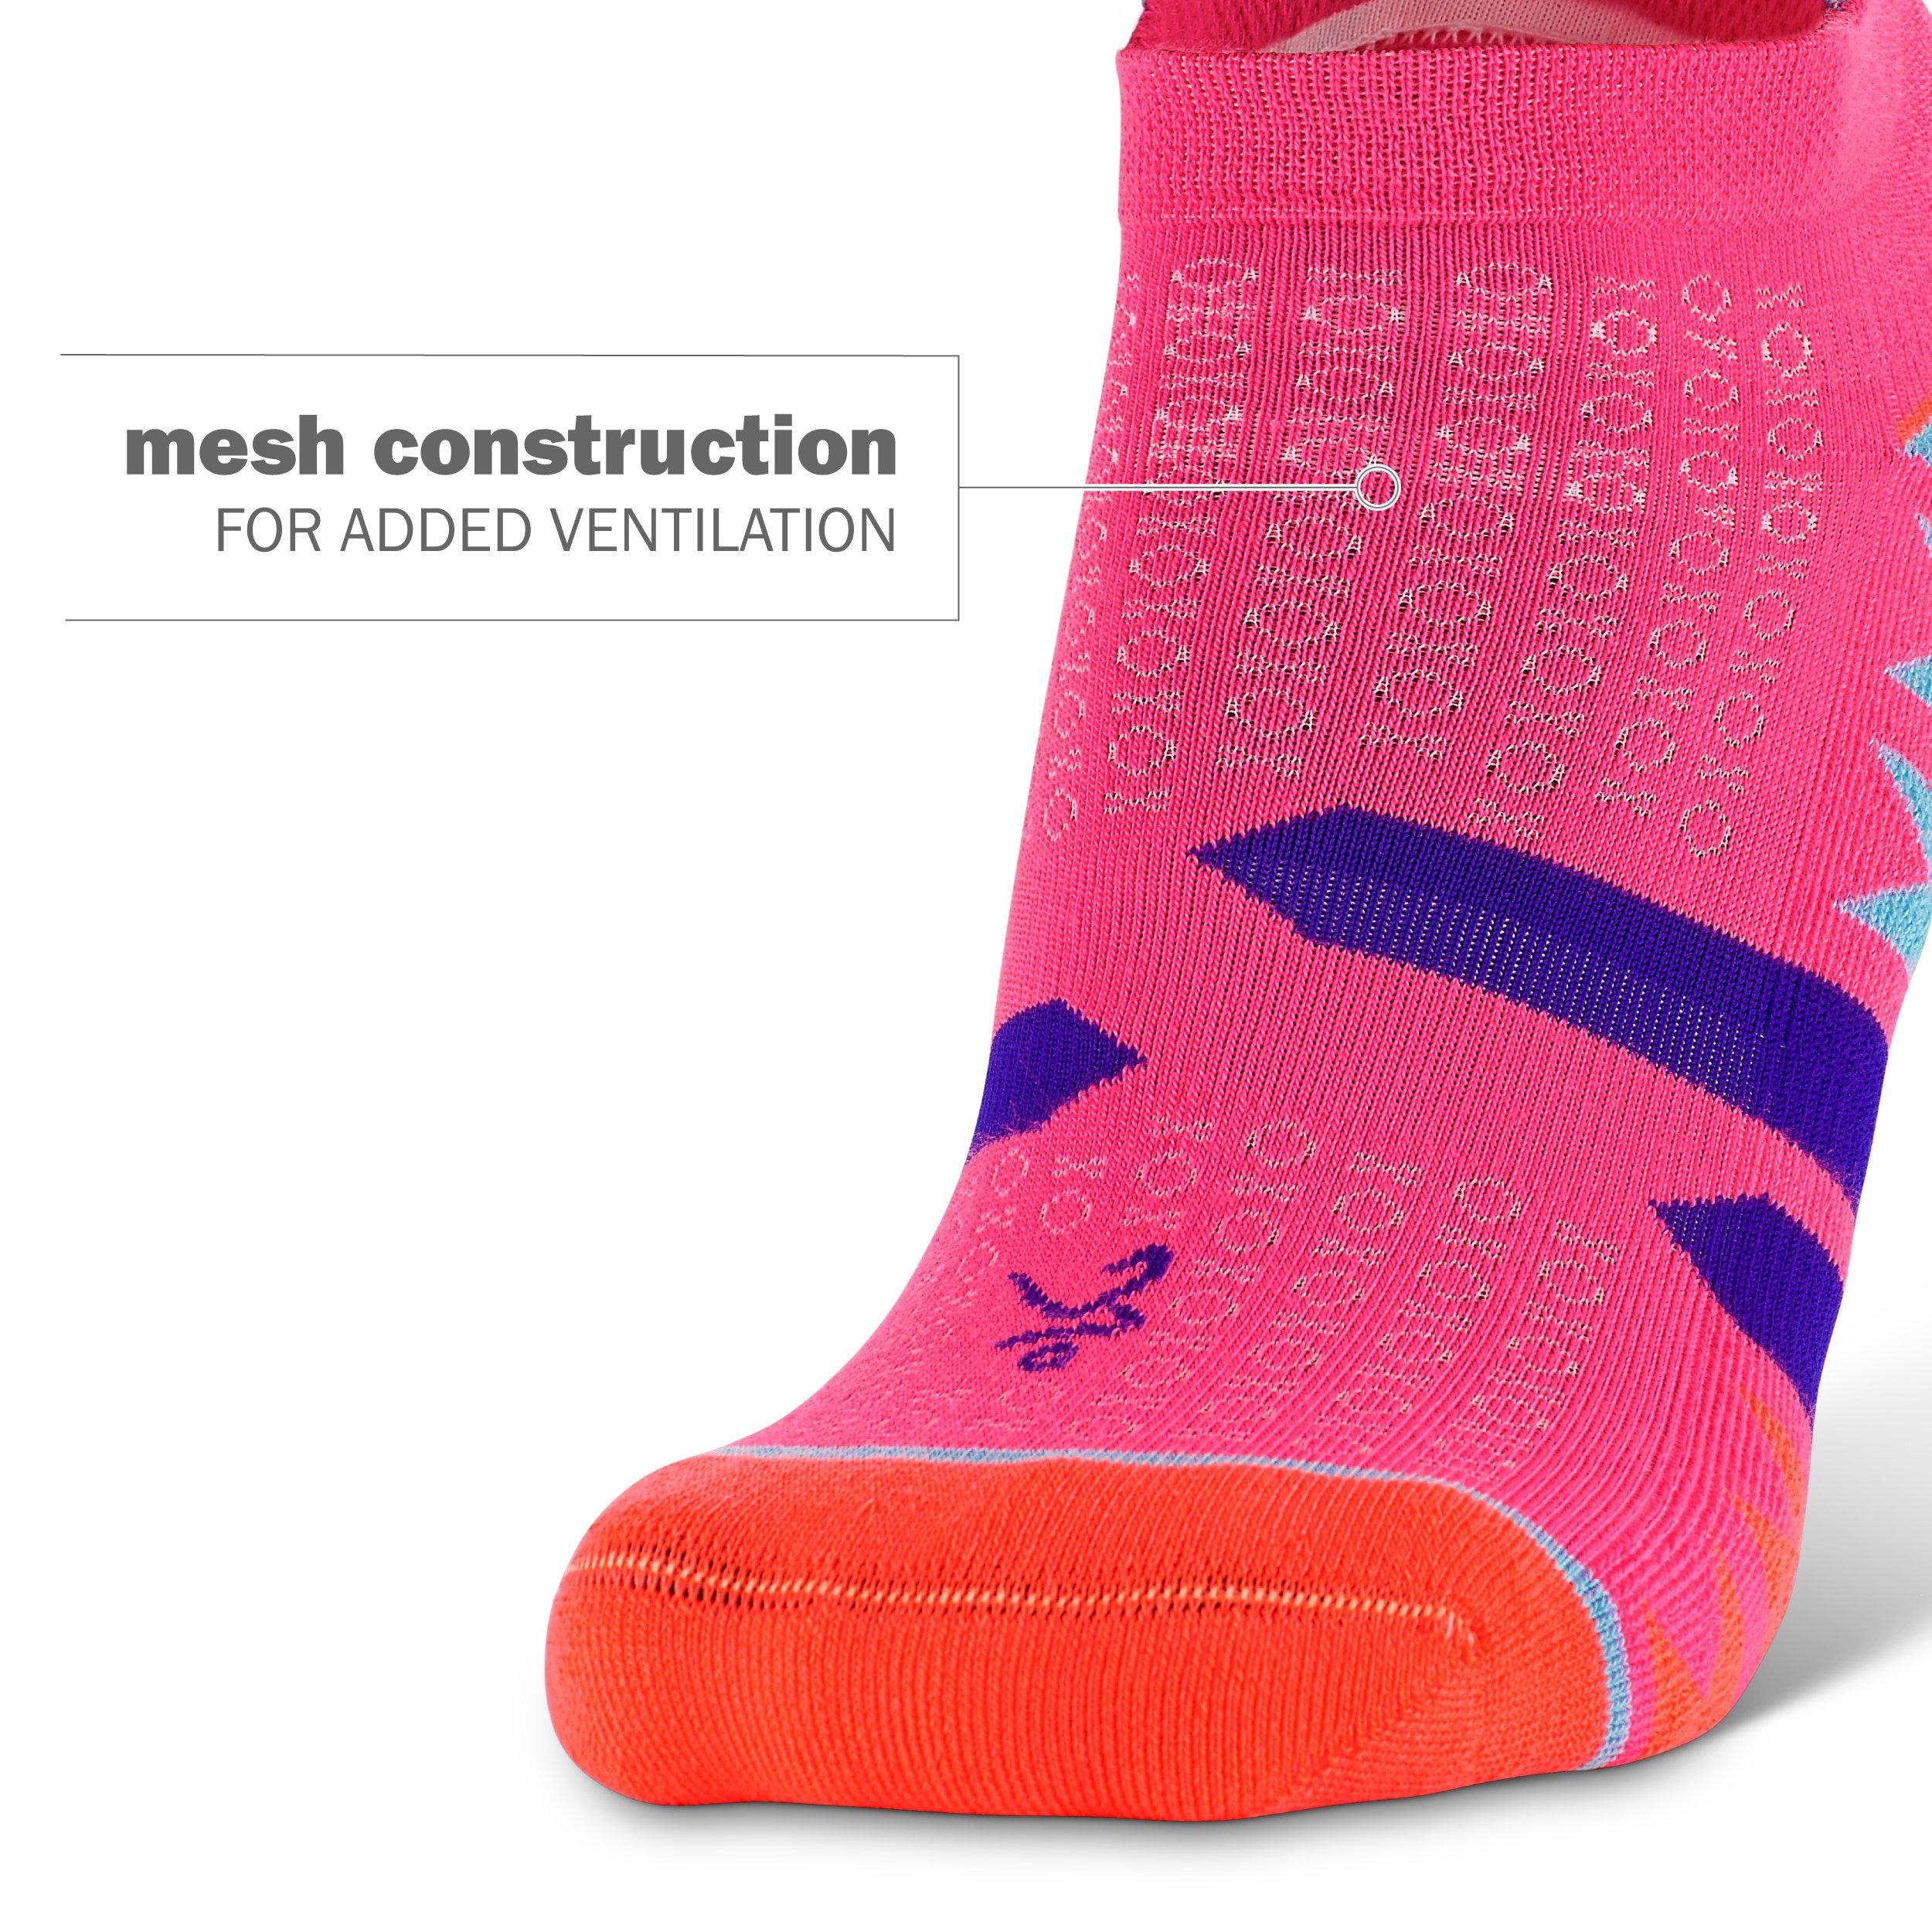 Balega Women's Enduro No Show Socks (1 Pair), Watermelon/Orange, Medium by Balega (Image #3)